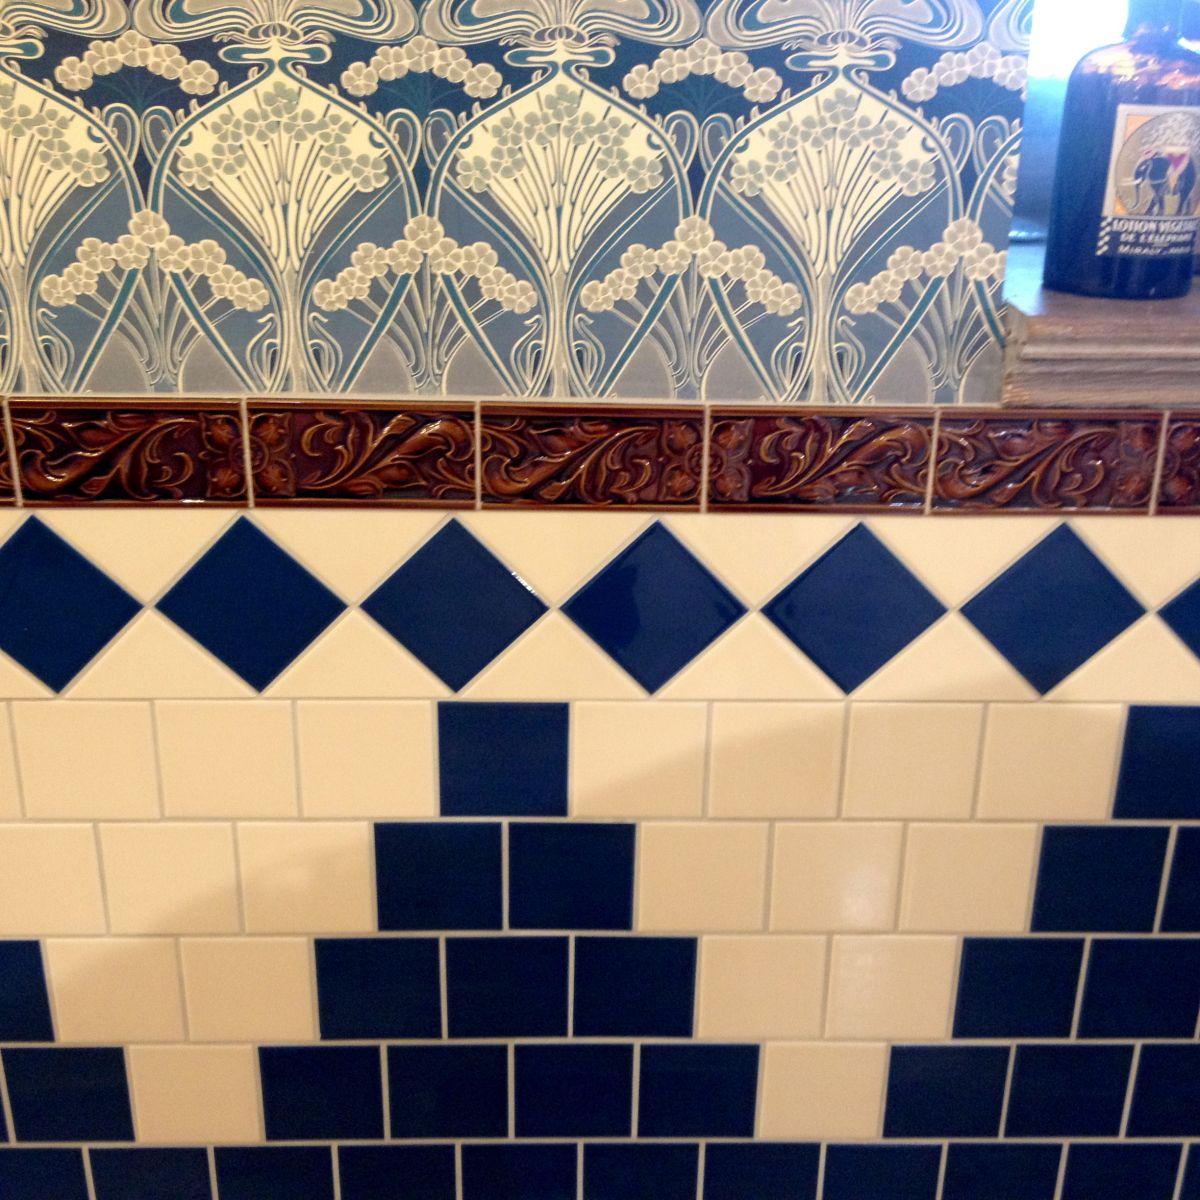 Demo Victorian Cressage decorative tiles 75x152mm - exterior use - laurel or chestnut 2